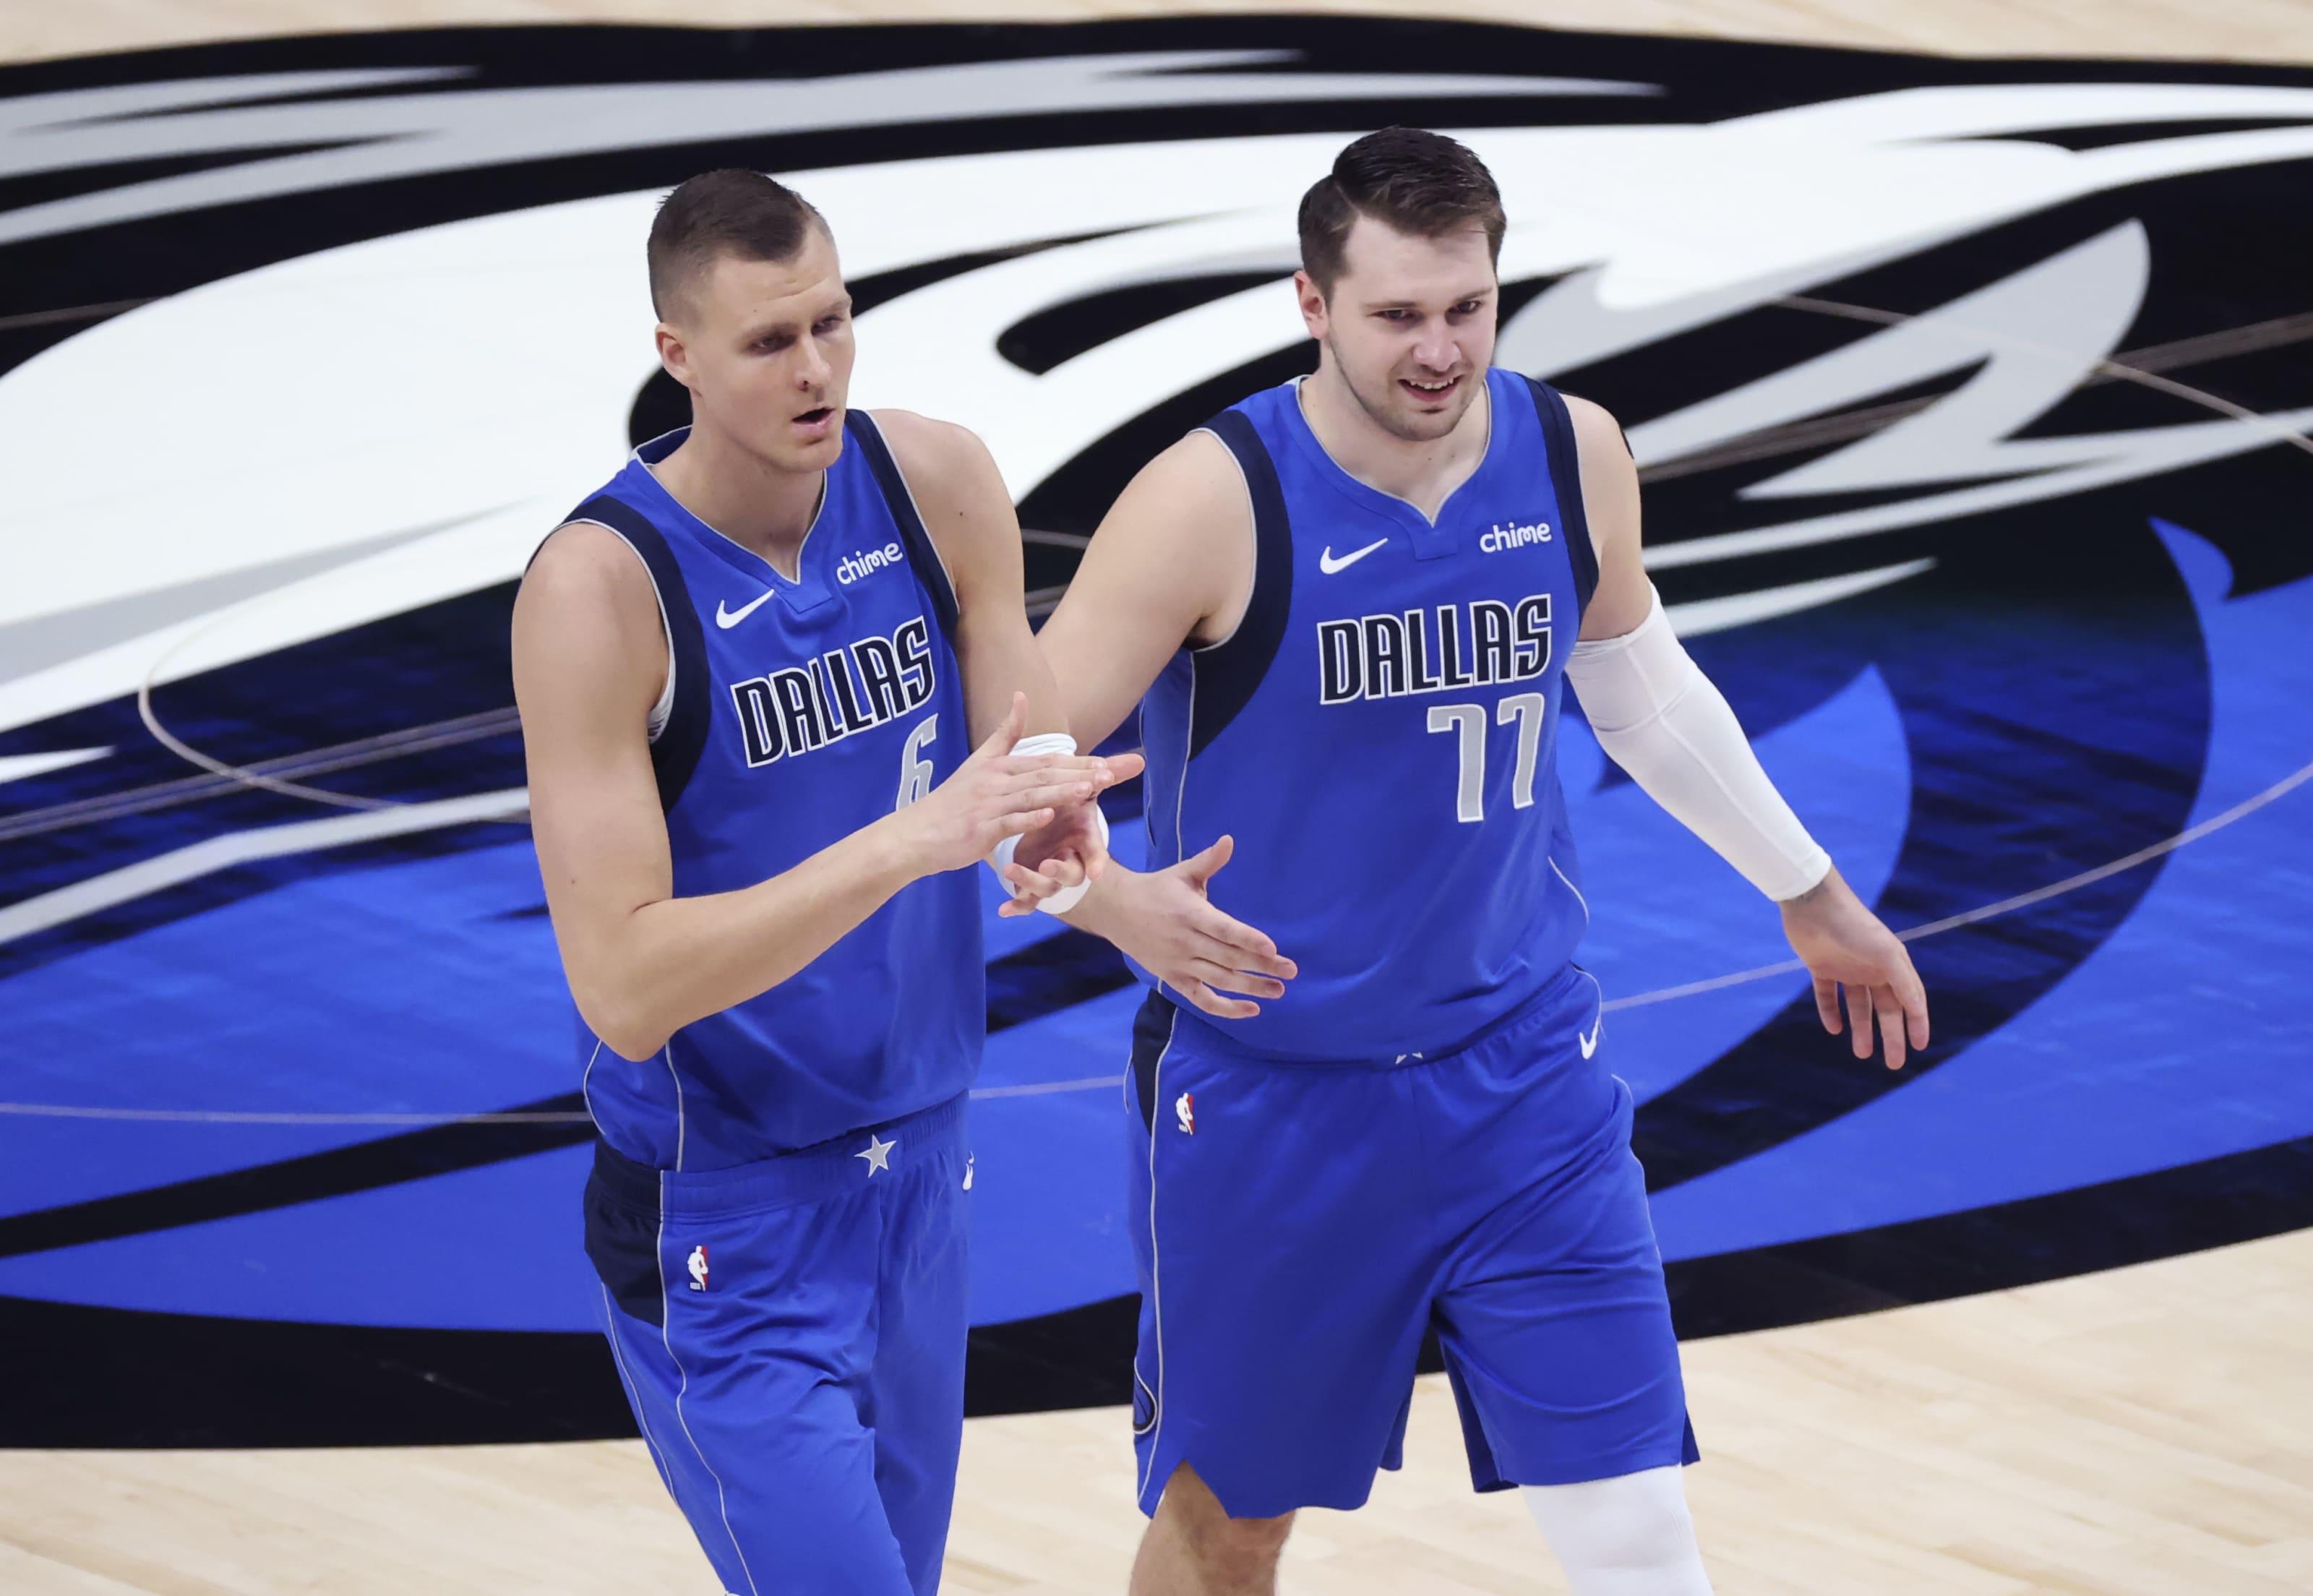 Dallas Mavericks: Kristaps Porzingis, Luka Doncic